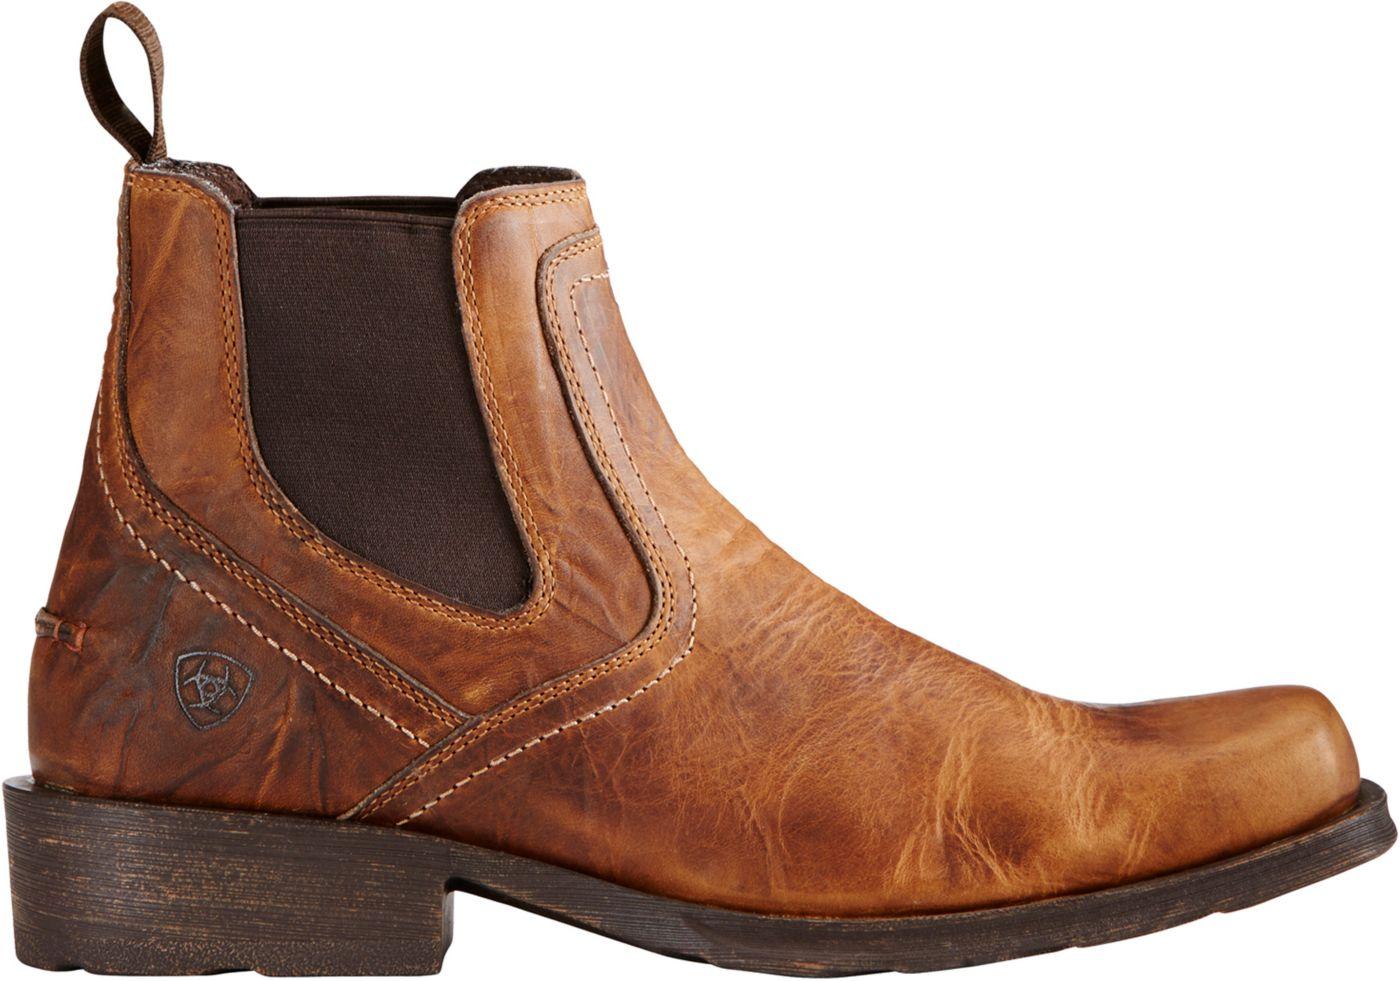 Ariat Men's Midtown Rambler Casual Boots